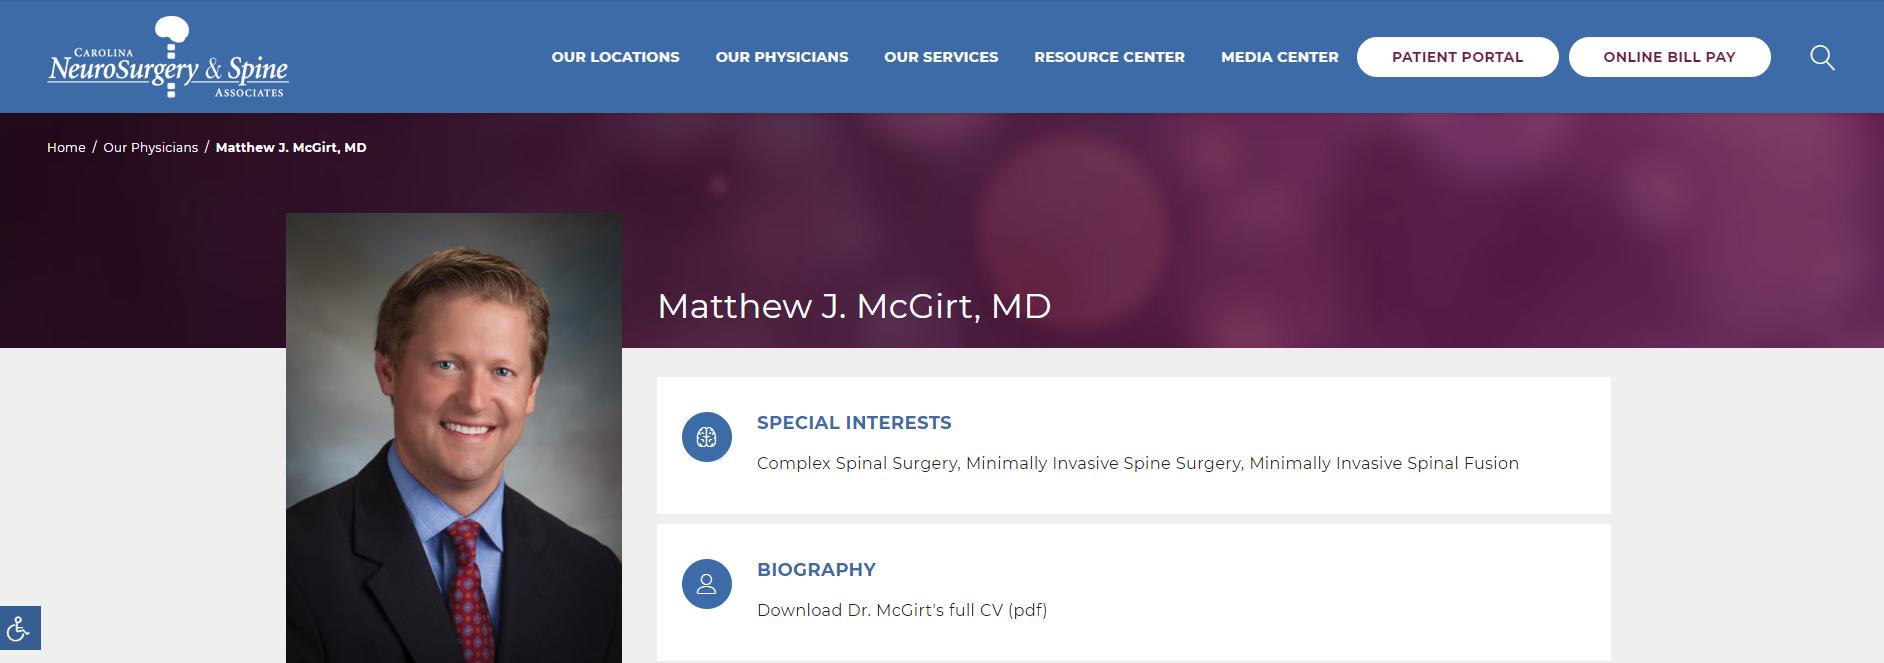 Matthew J. McGirt, MD